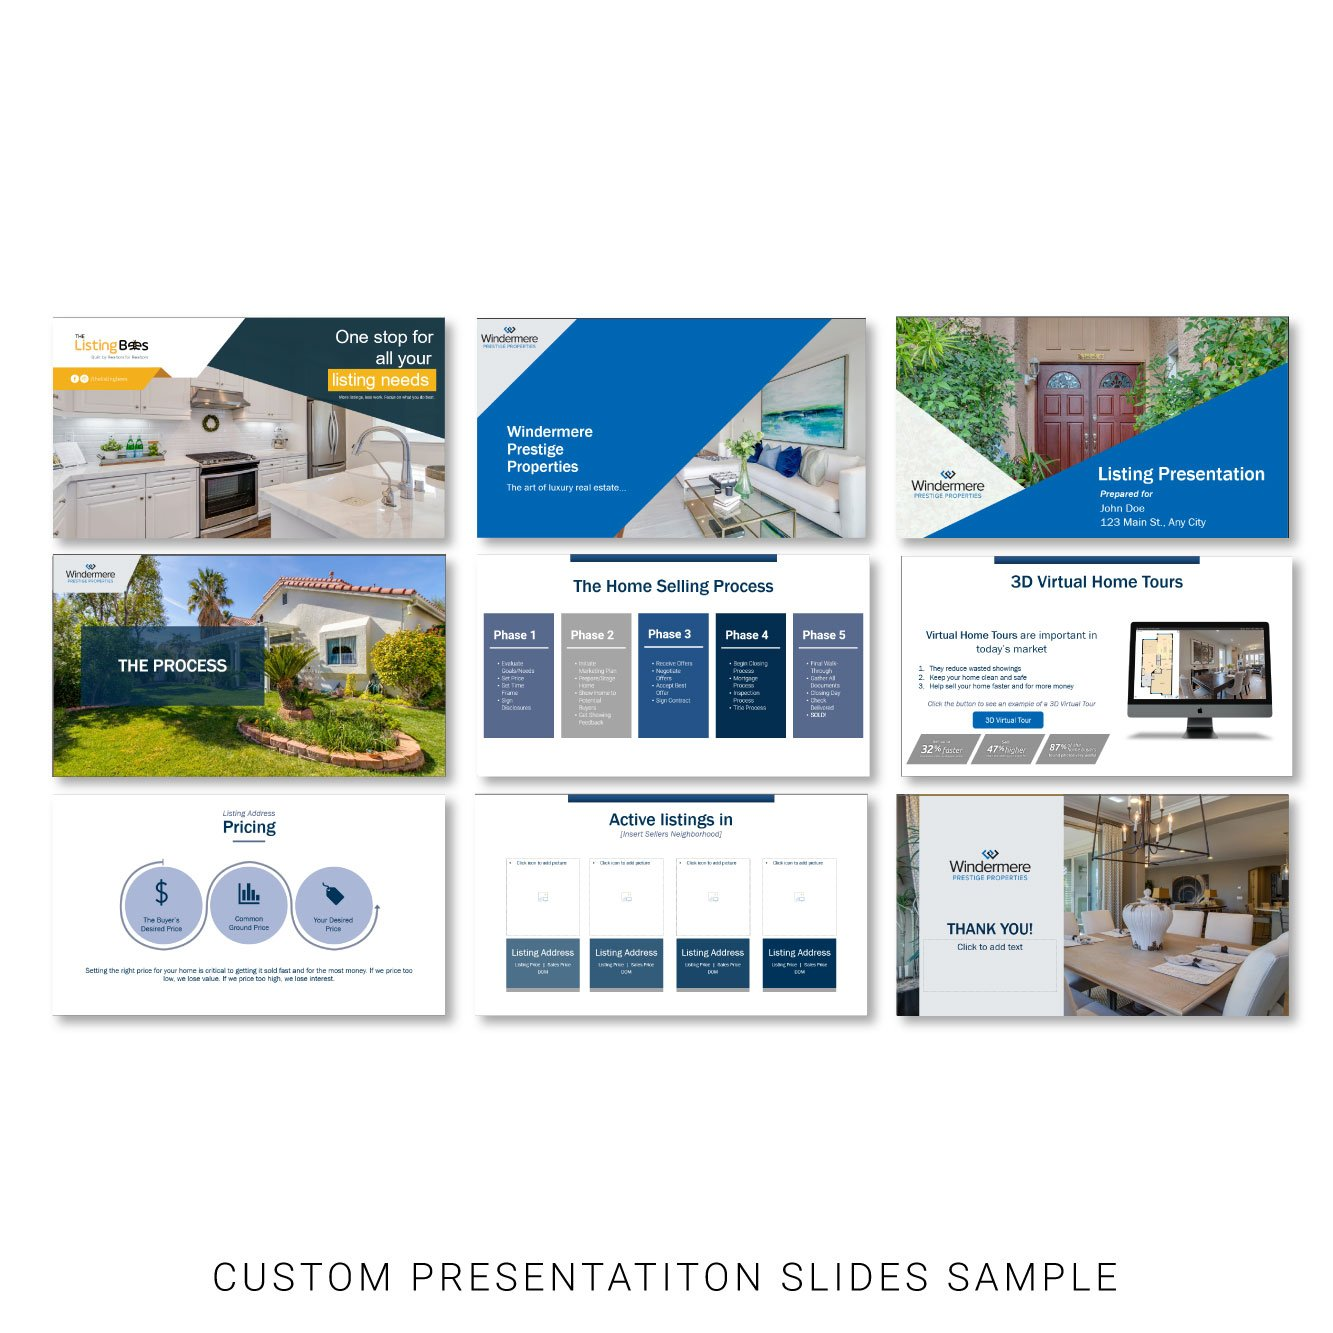 Listing Presentation Sample